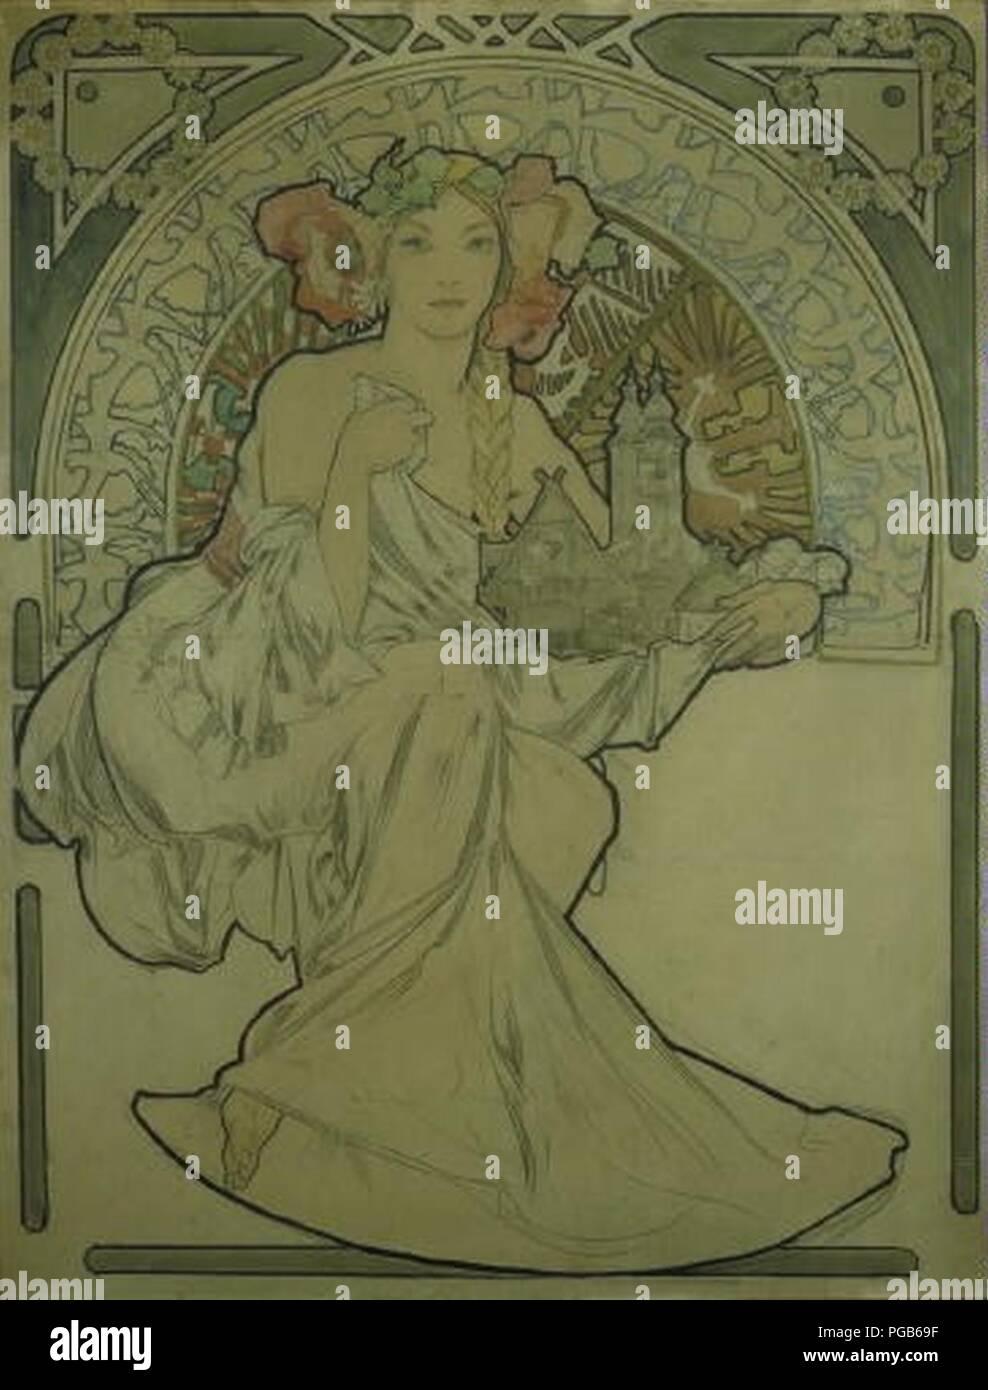 Autor Alfons Mucha 24.7.1860-14.7,1939 - Navrh na plakat pro inzenyrstvi Vystavu architektury un v Praze. Banque D'Images